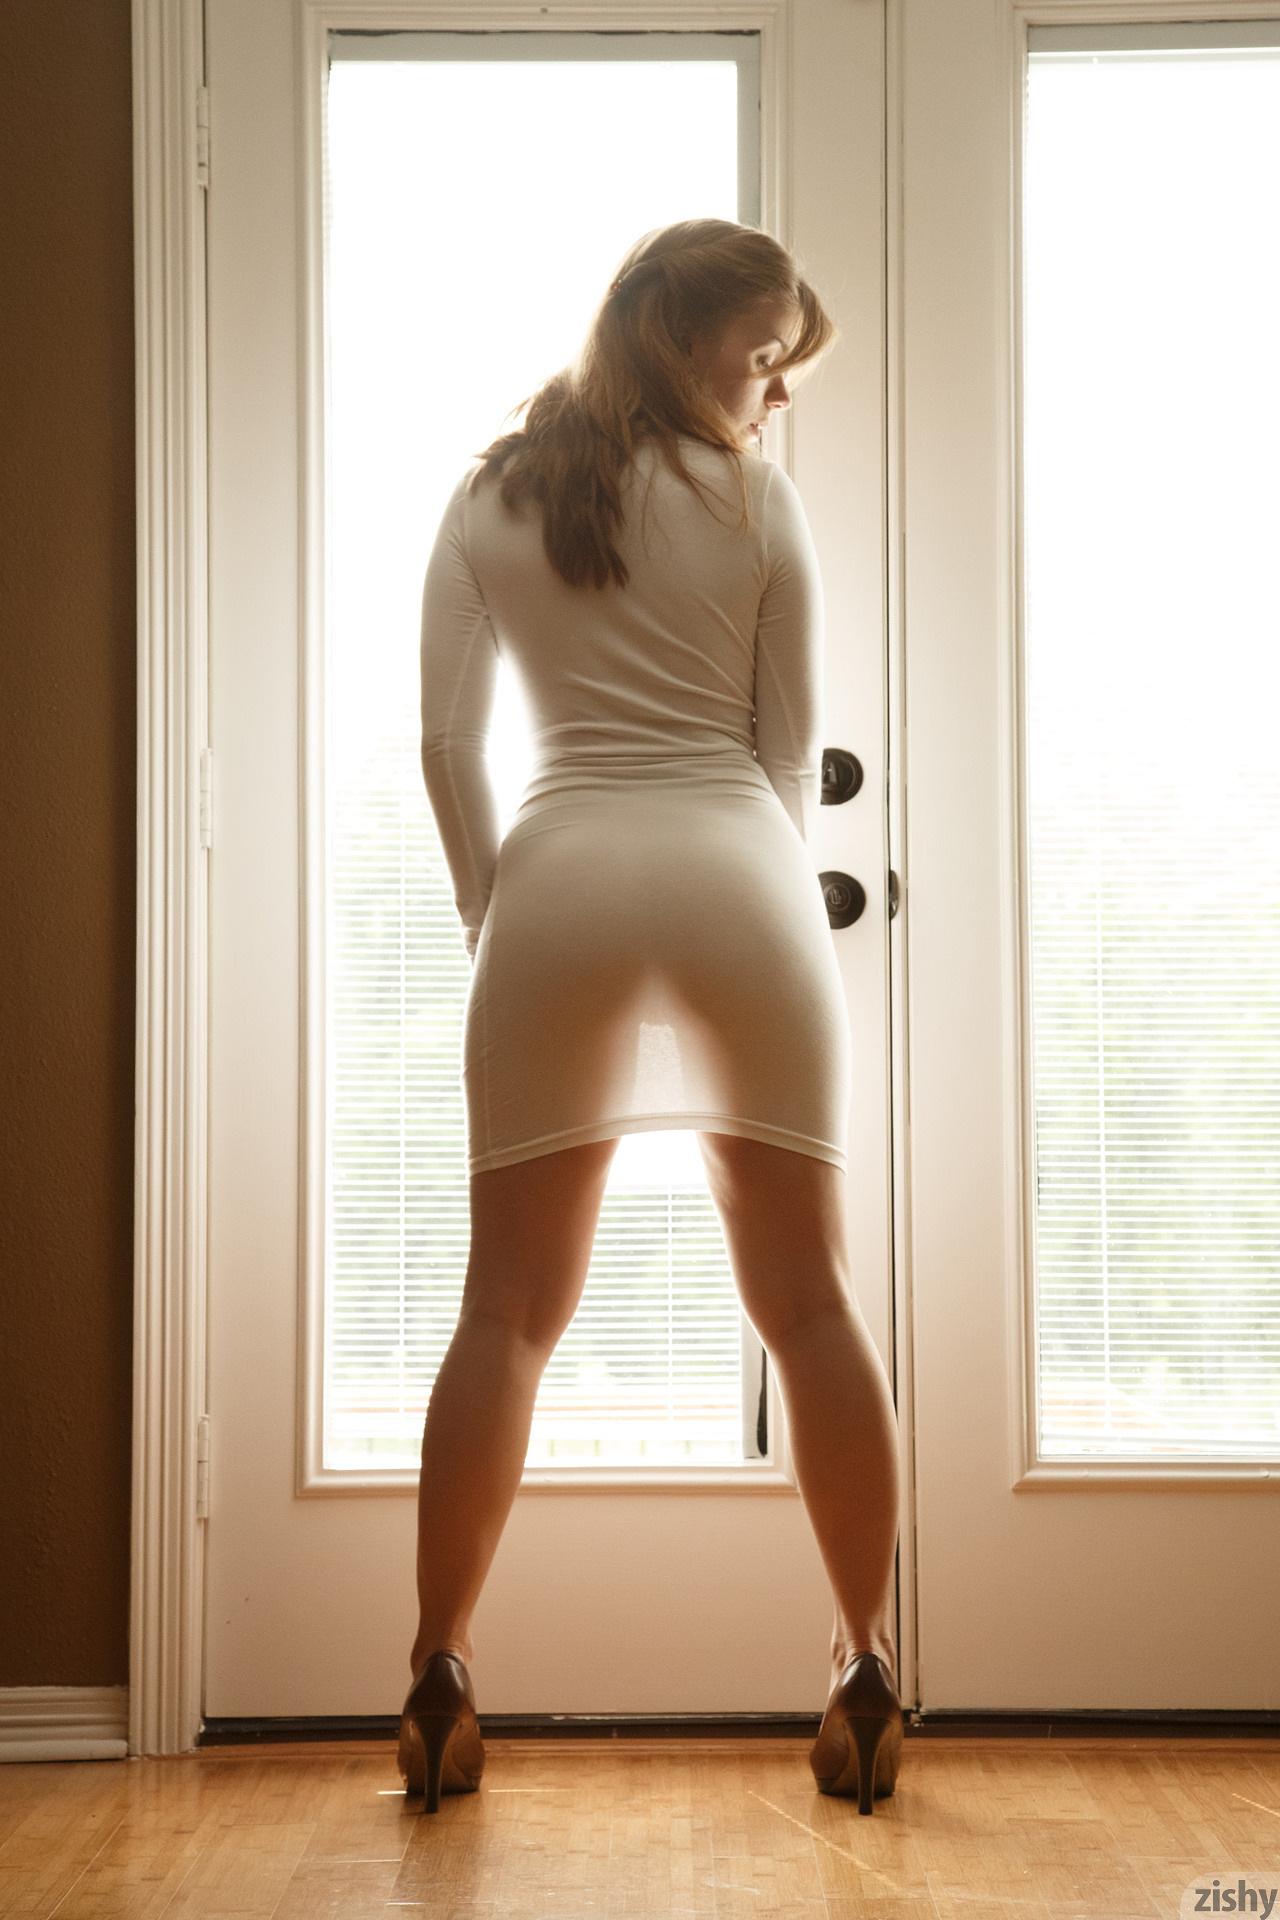 Natalie austin dress test